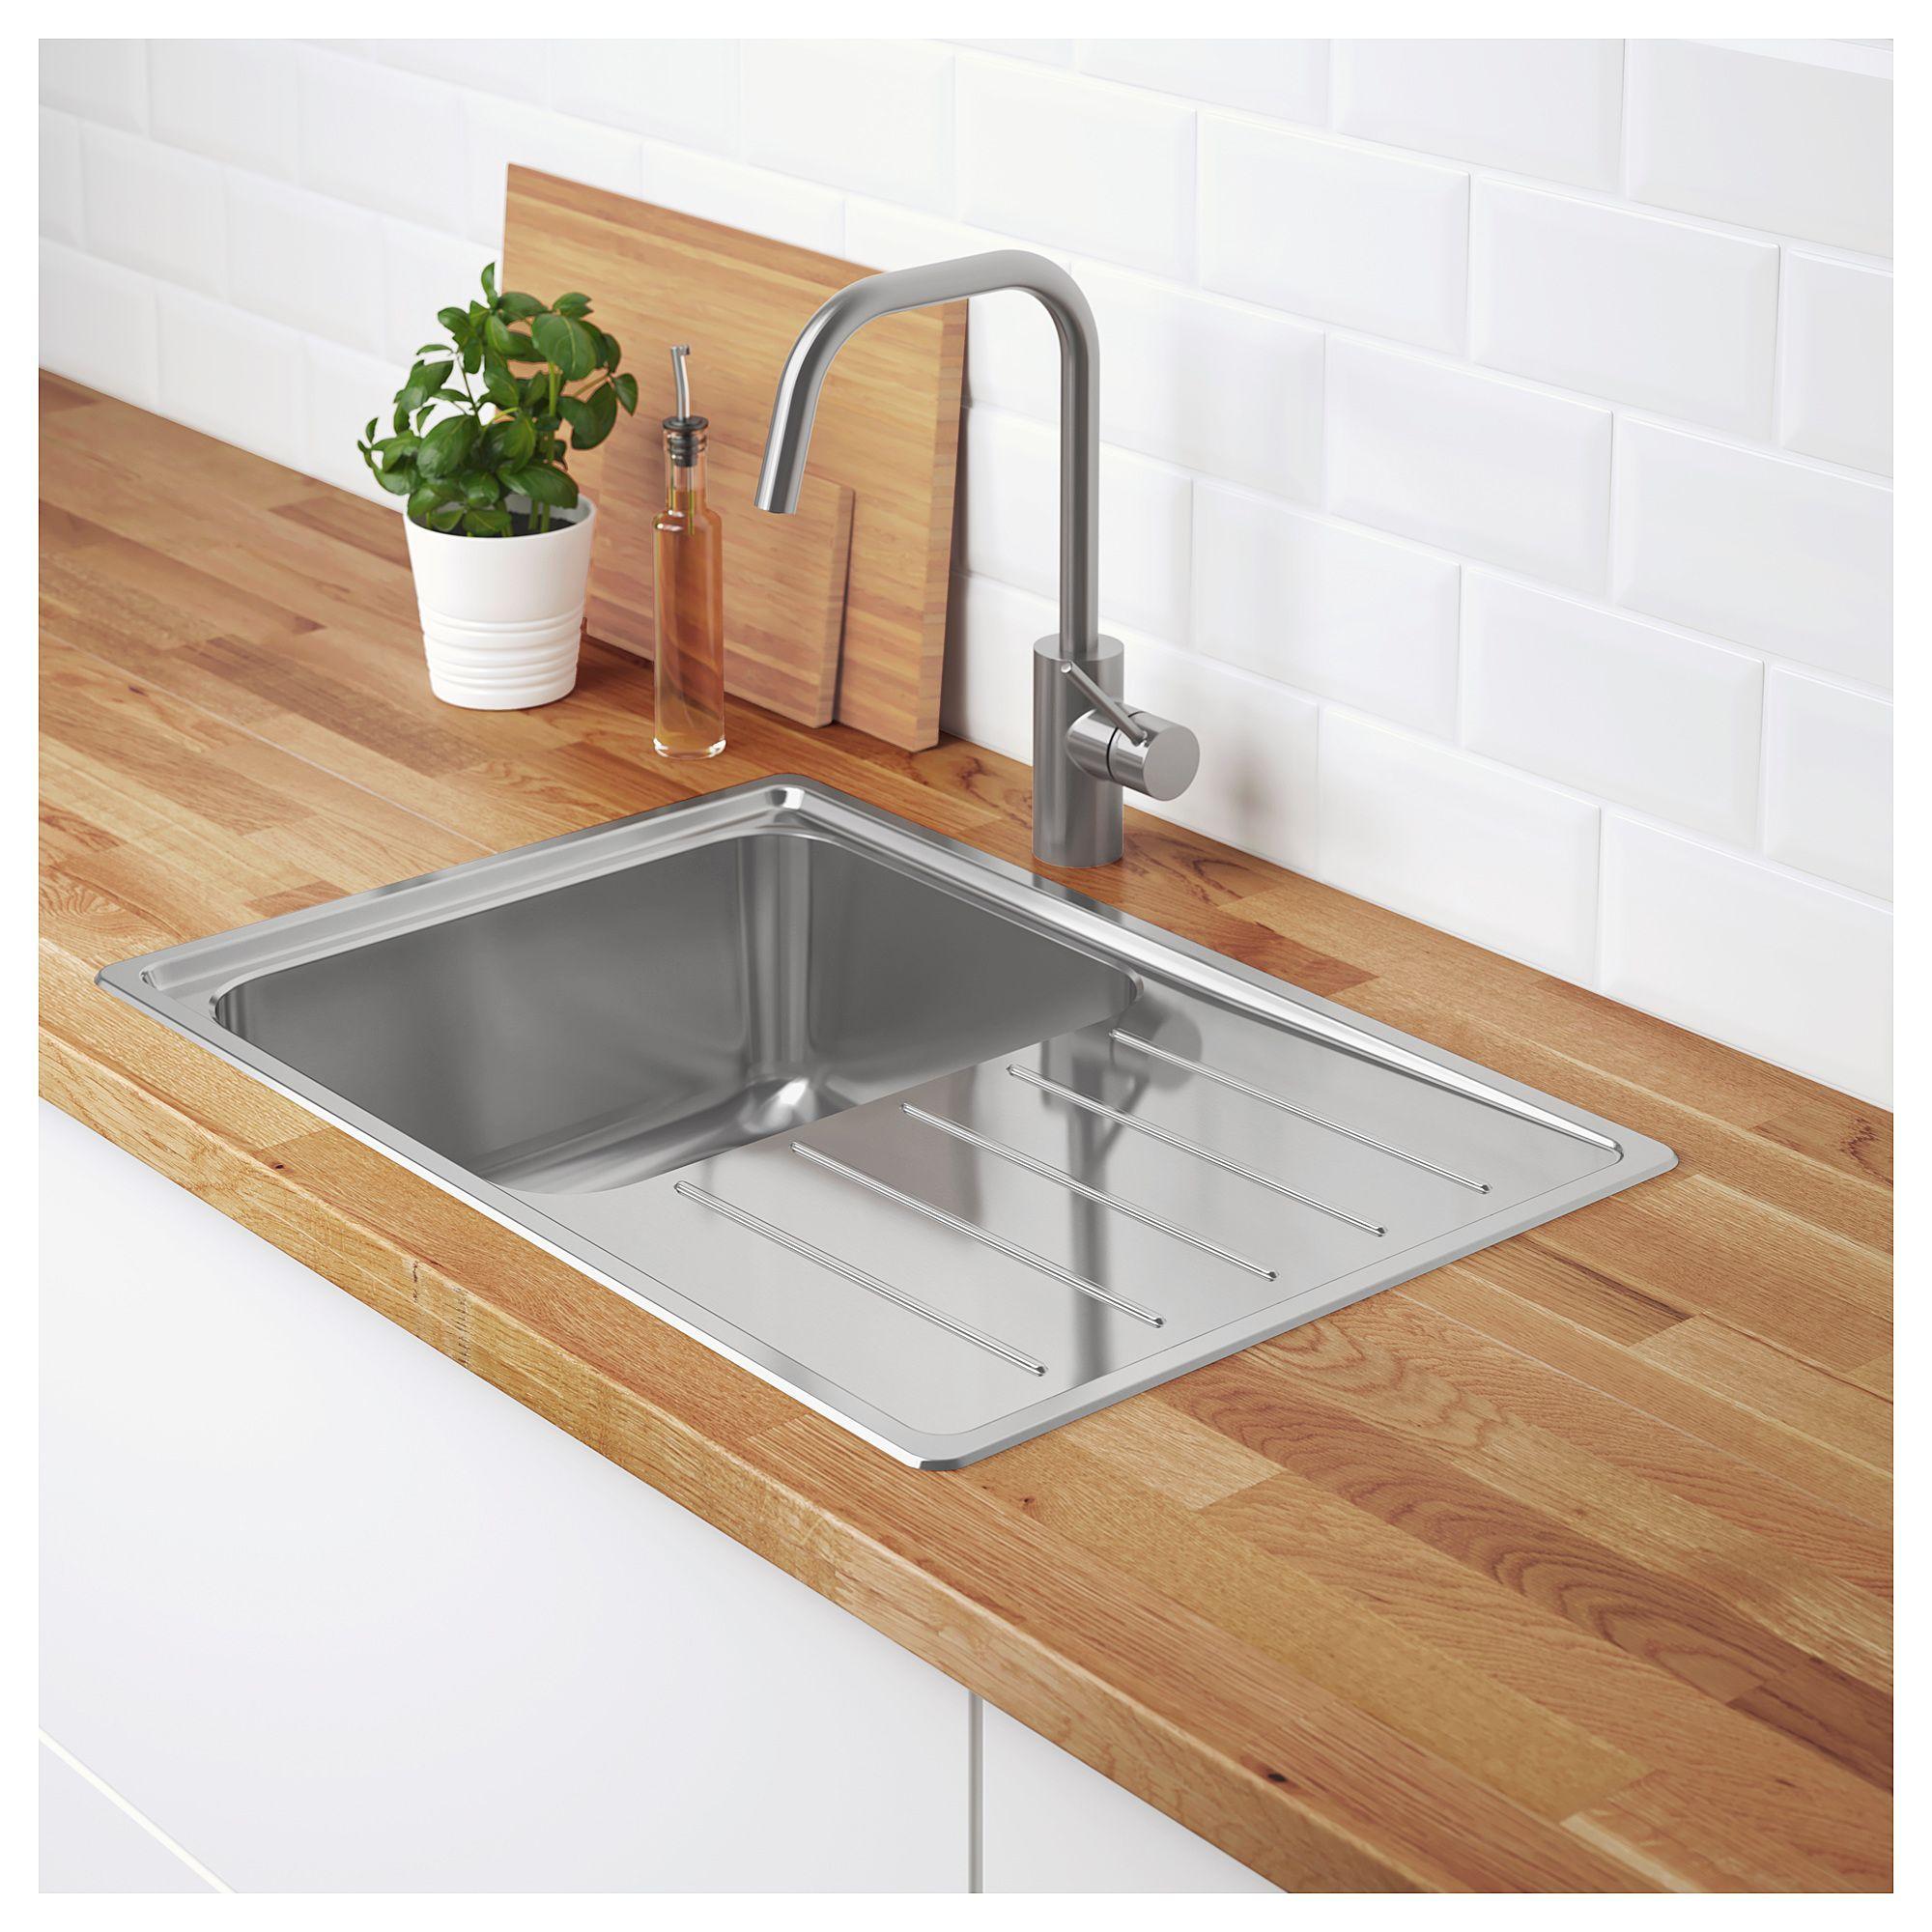 Ikea Vattudalen Single Bowl Top Mount Sink Stainless Steel Inset Sink Kitchen Countertops Sink